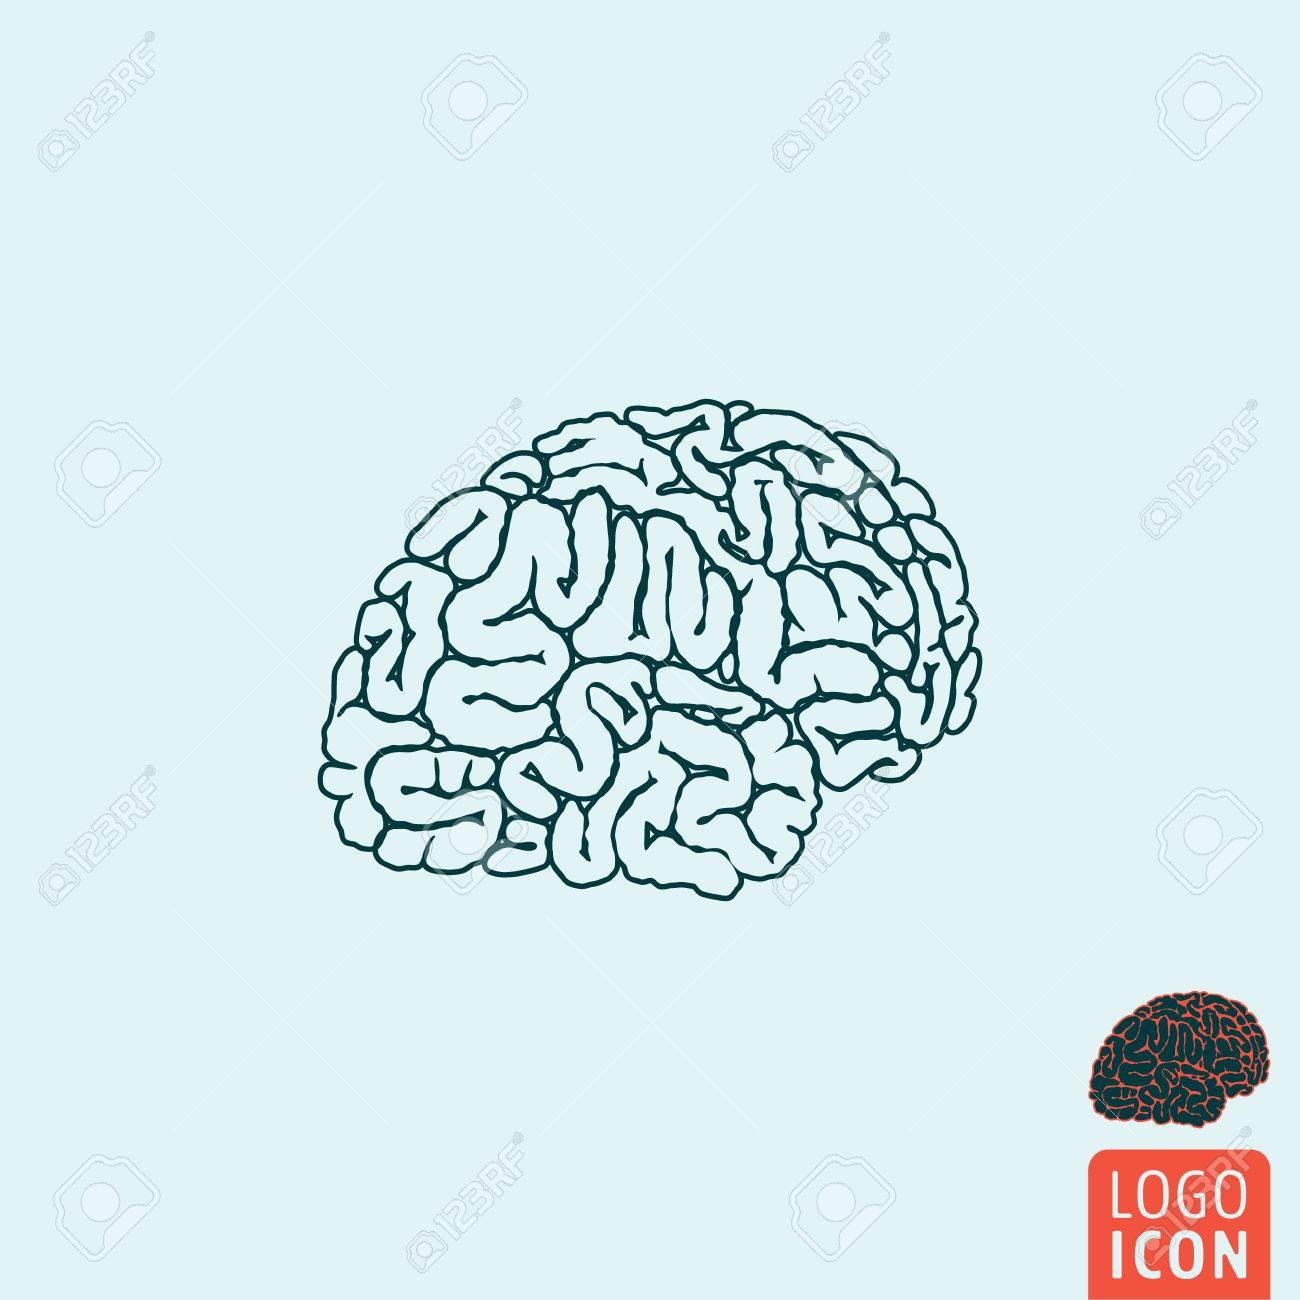 Brain icon brain symbol human brain icon isolated minimal brain icon brain symbol human brain icon isolated minimal design vector illustration biocorpaavc Images